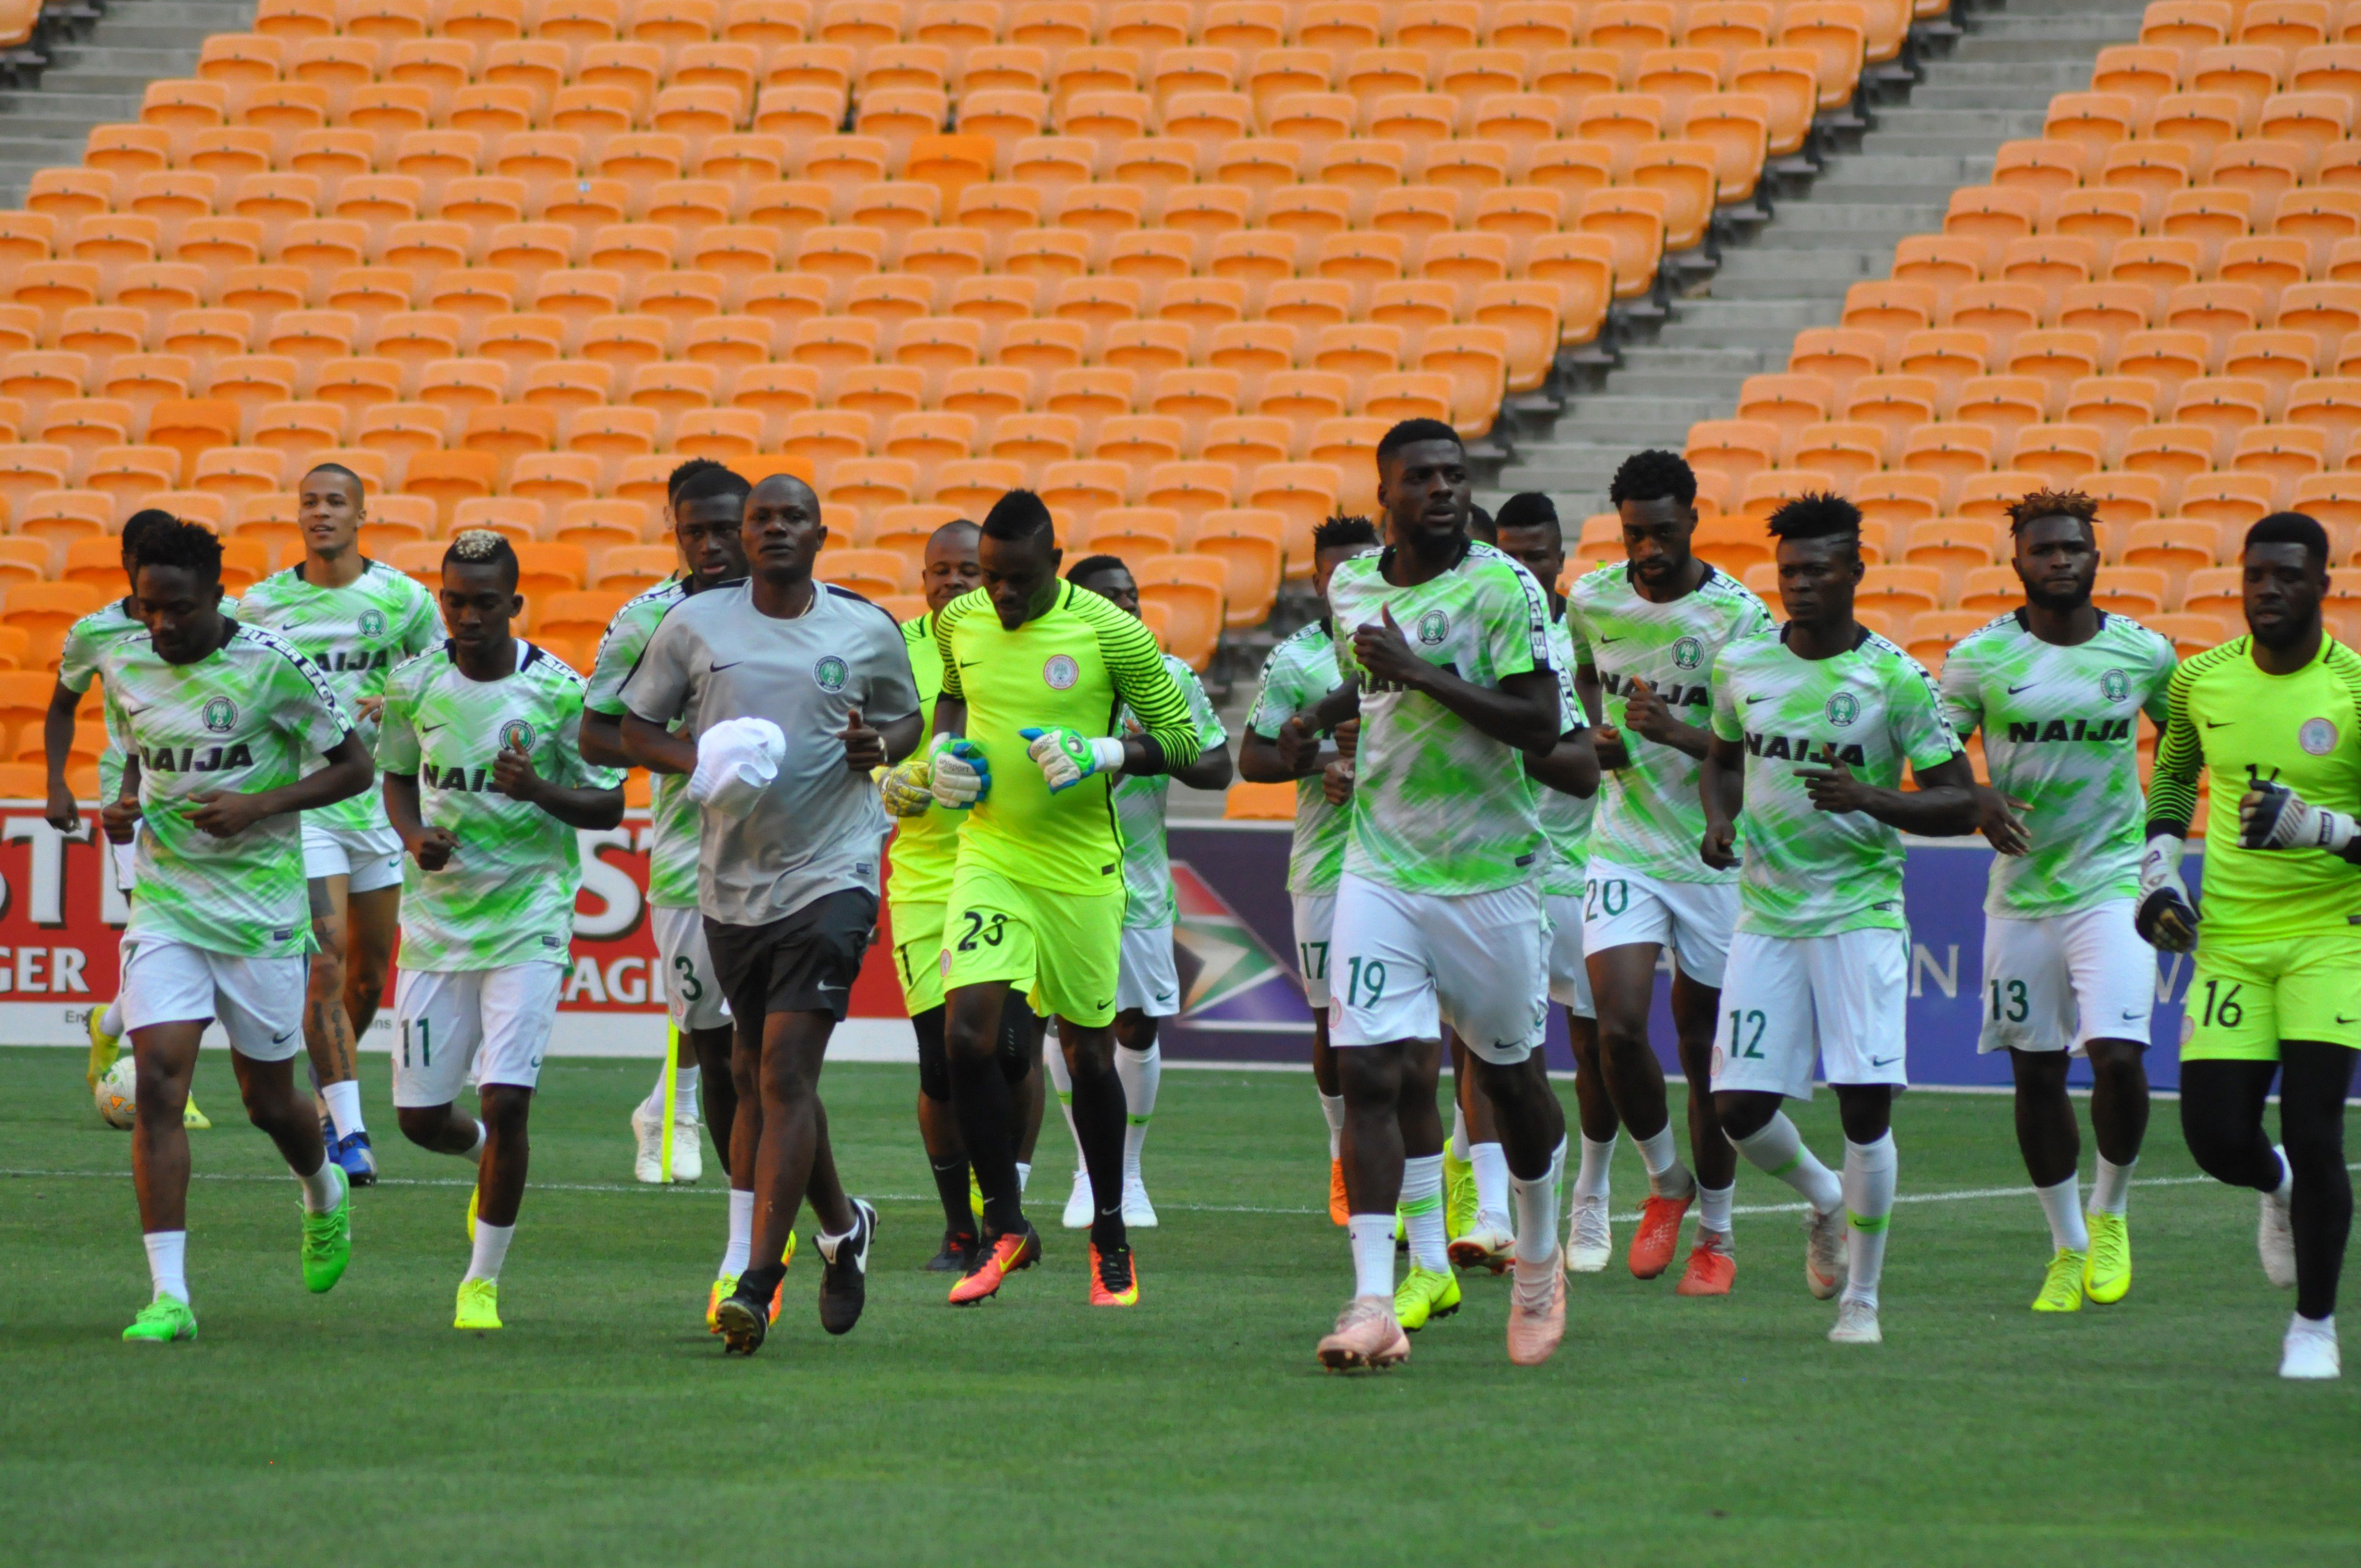 Rohr Adopts 3-5-2 Formation Vs South Africa; Ezenwa In Goal; Ogu, Kalu Start; Musa, Iheanacho Lead Attack